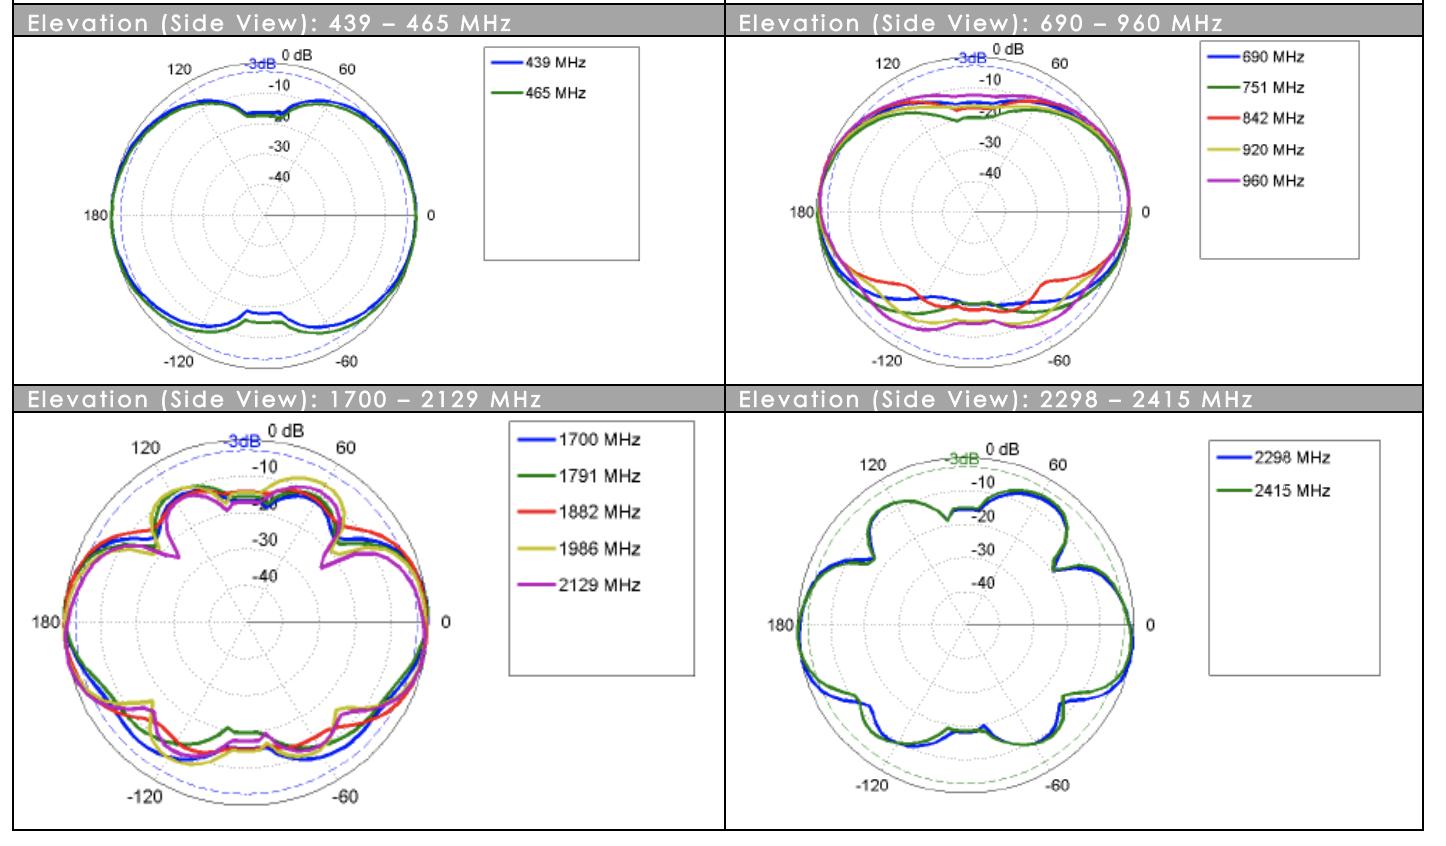 omni-291-antenna-elevation-radiation-pattern